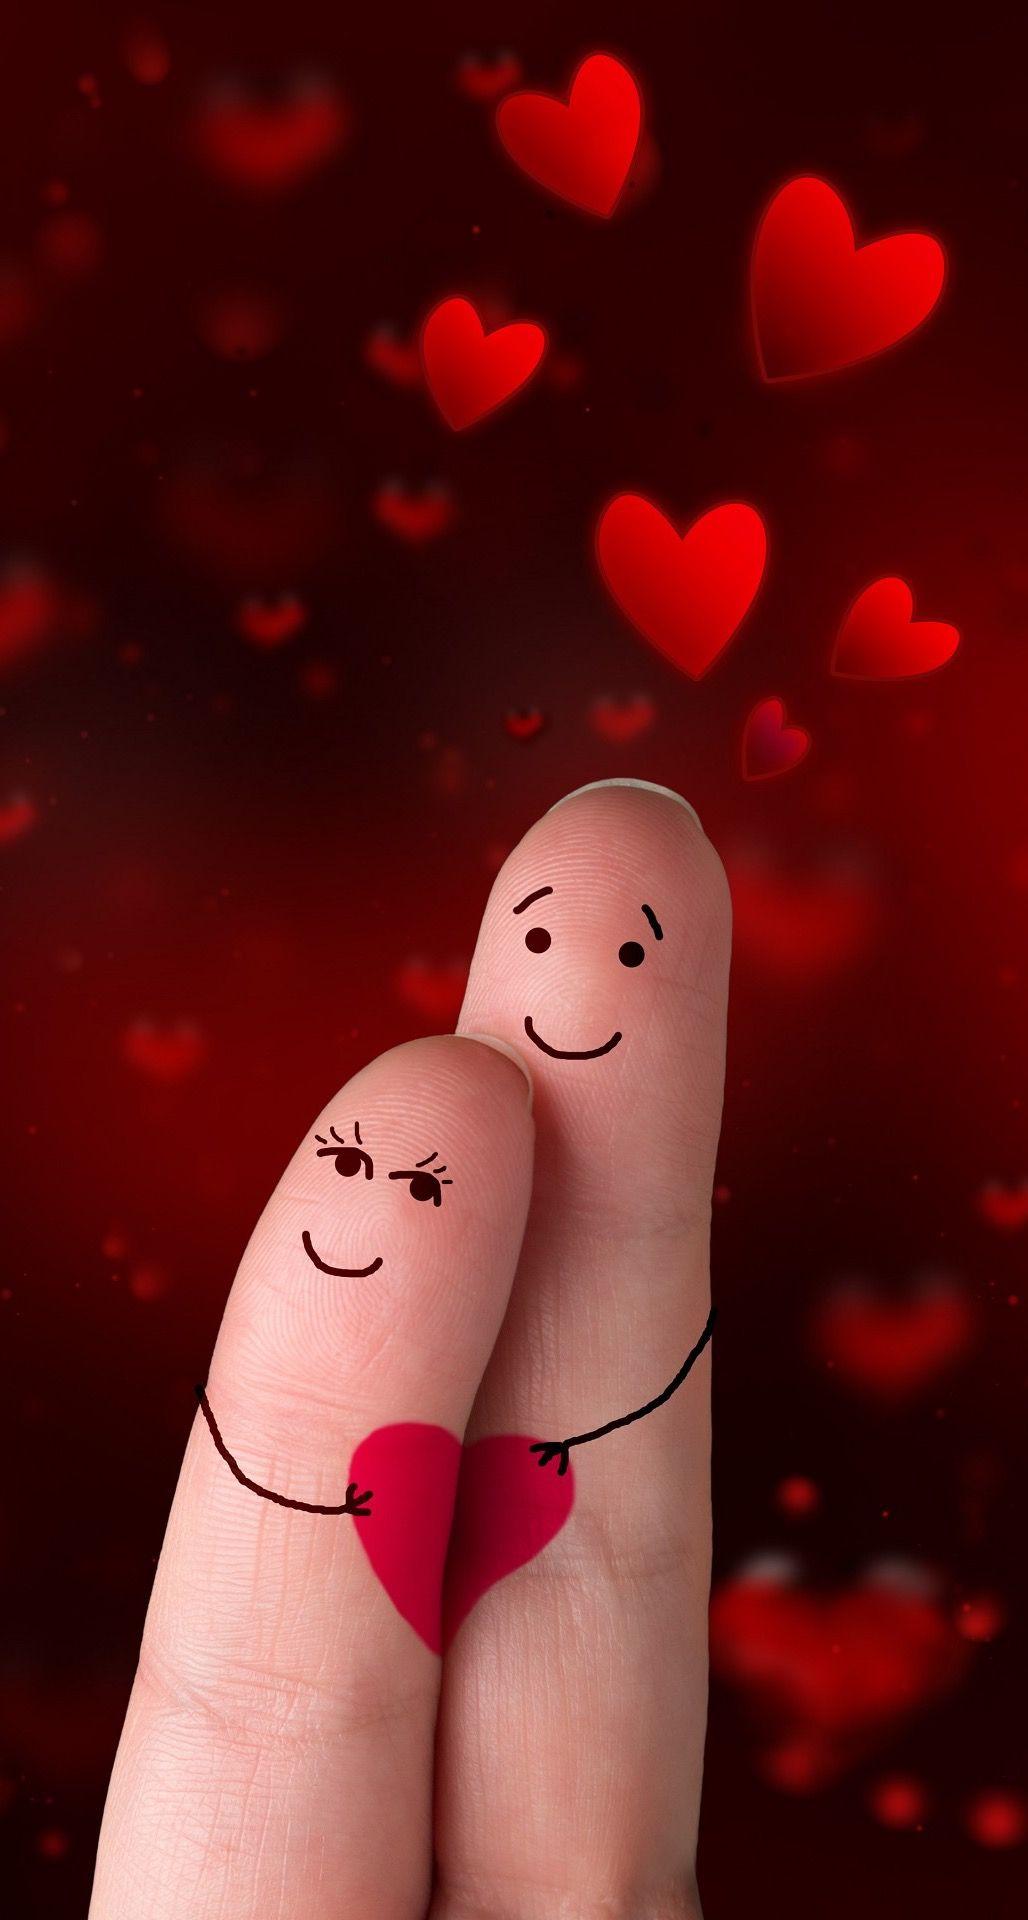 Romantic love